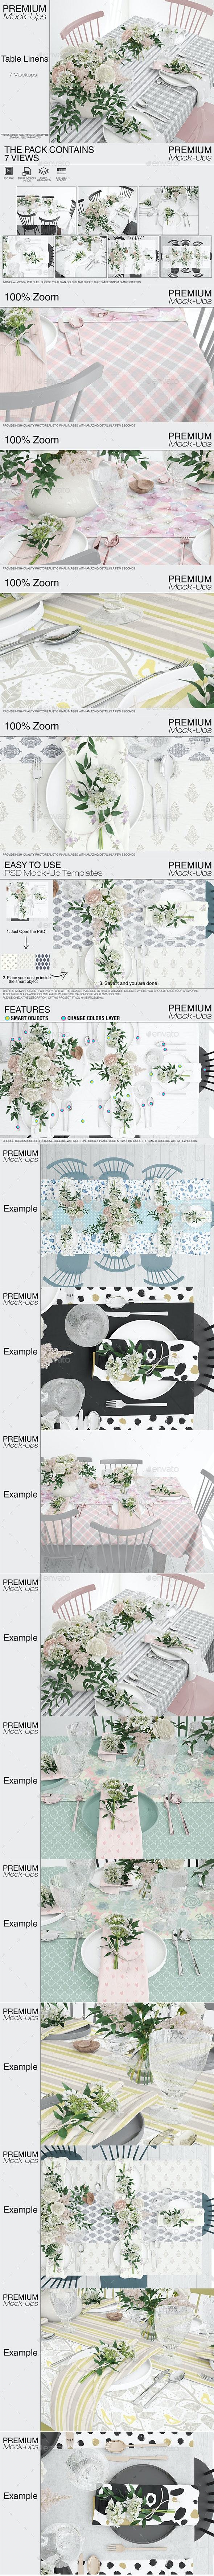 Tablecloth, Runner & Napkins - Print Product Mock-Ups